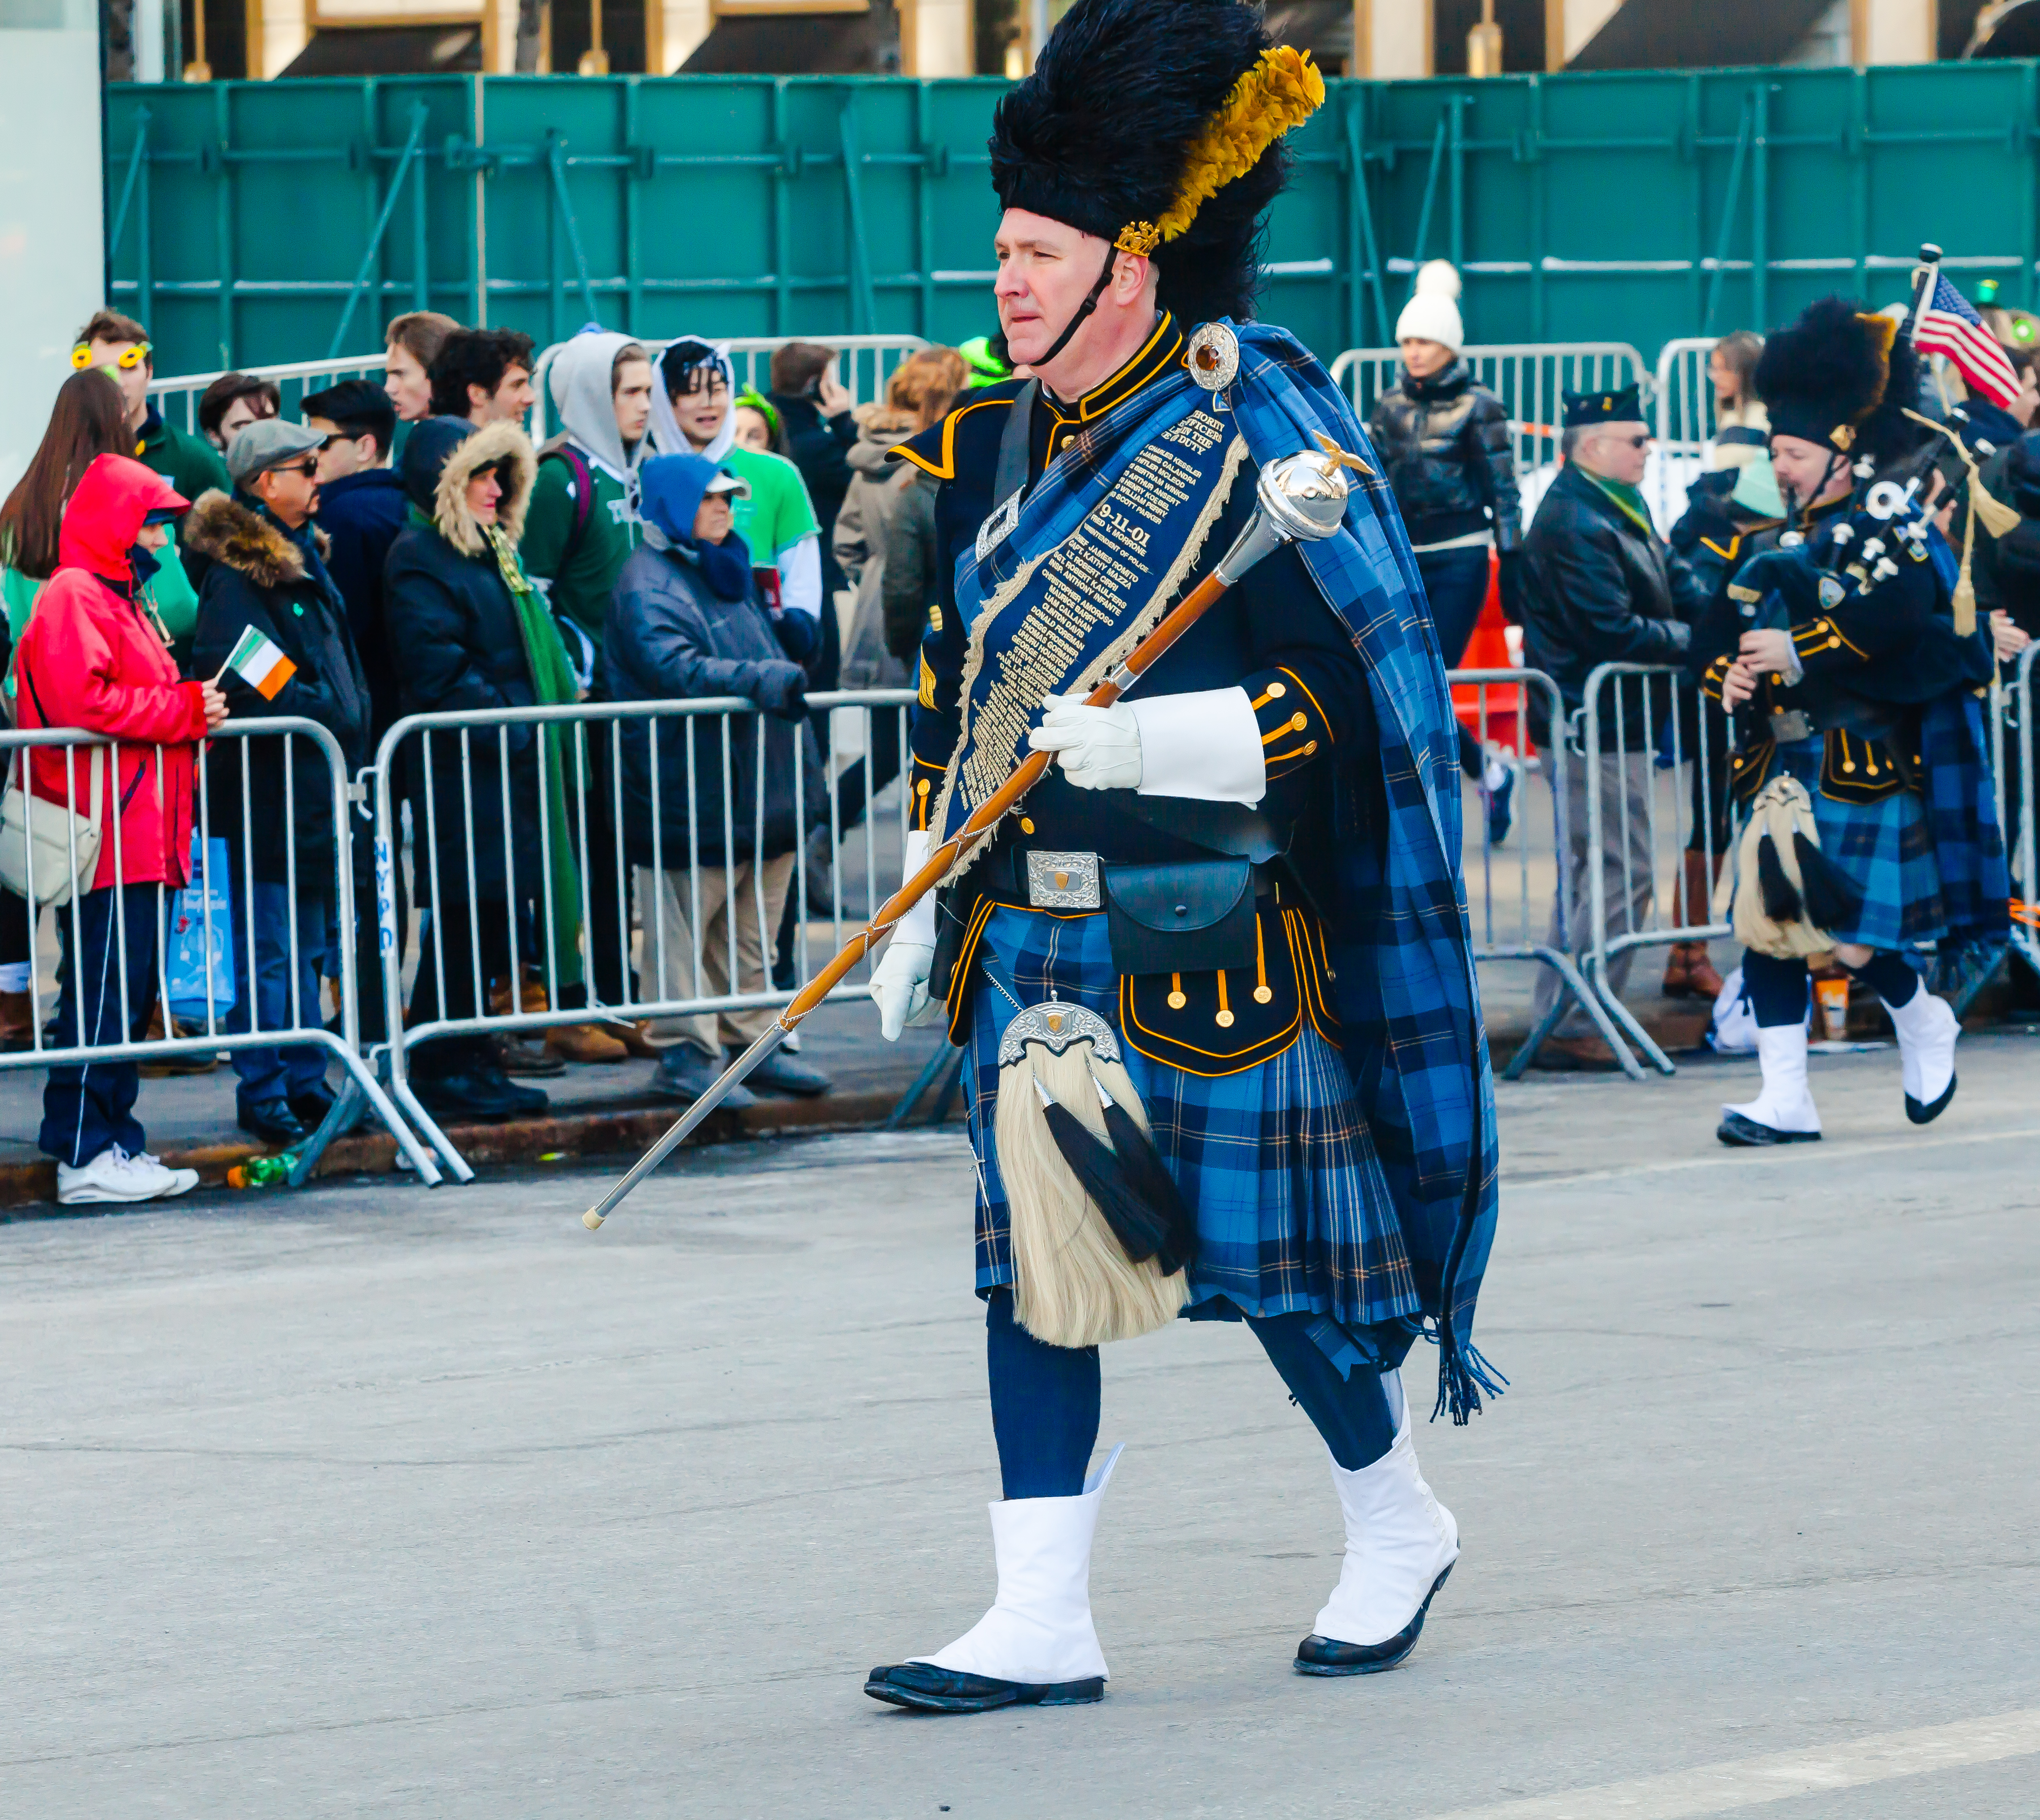 St. Patti detailed Irish uniform photos